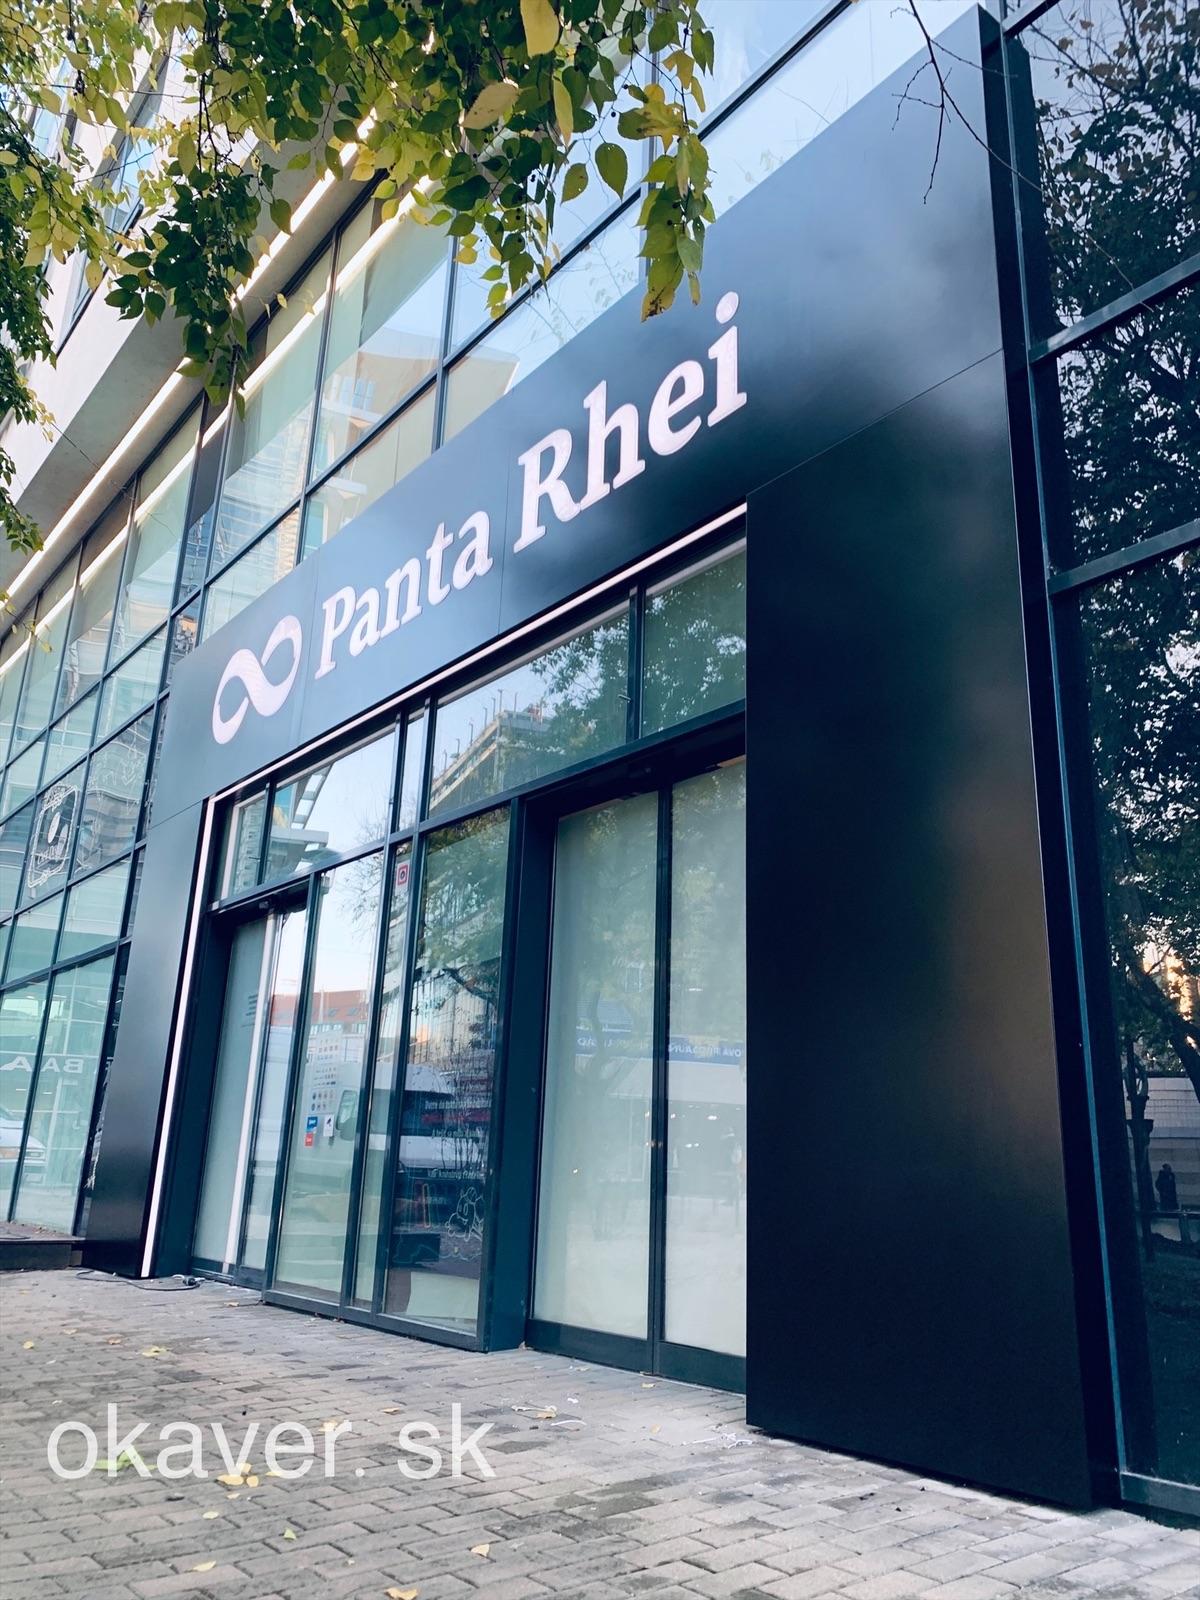 Panta Rhei - Bratislava, okaver